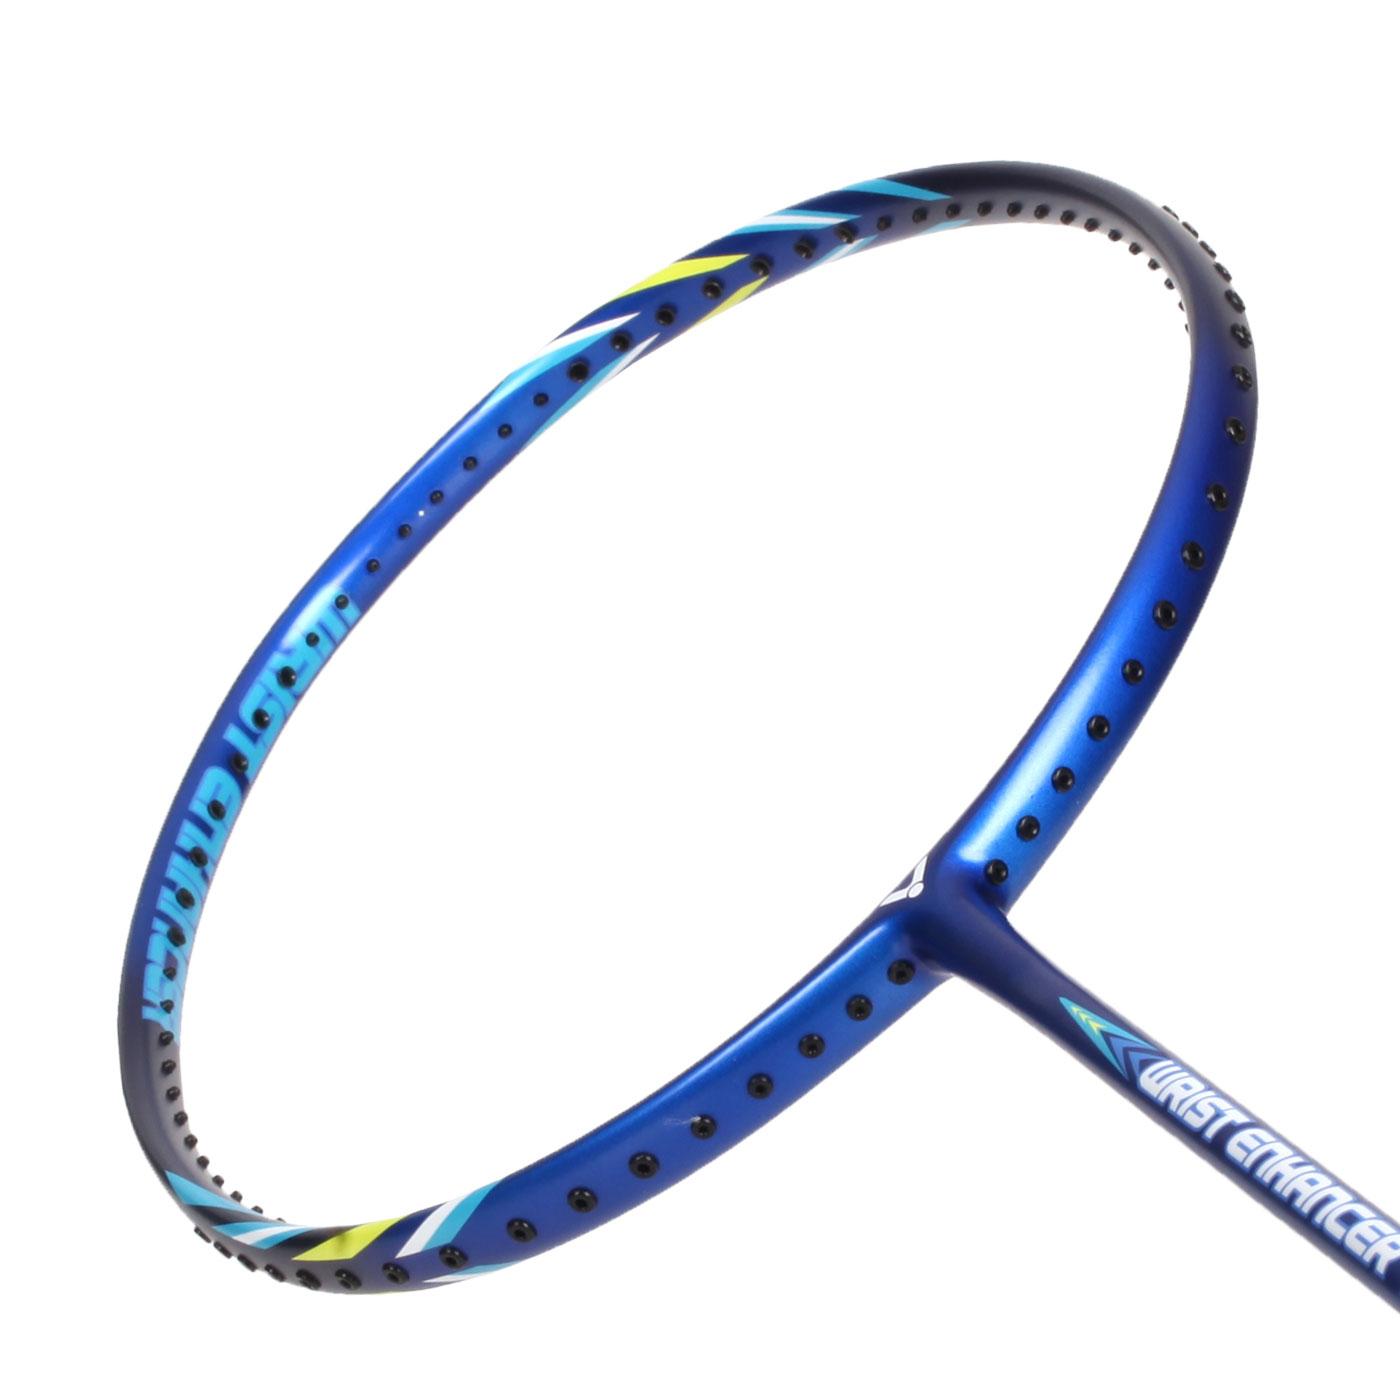 VICTOR 重量訓練球拍 WE-140 - 寶藍白